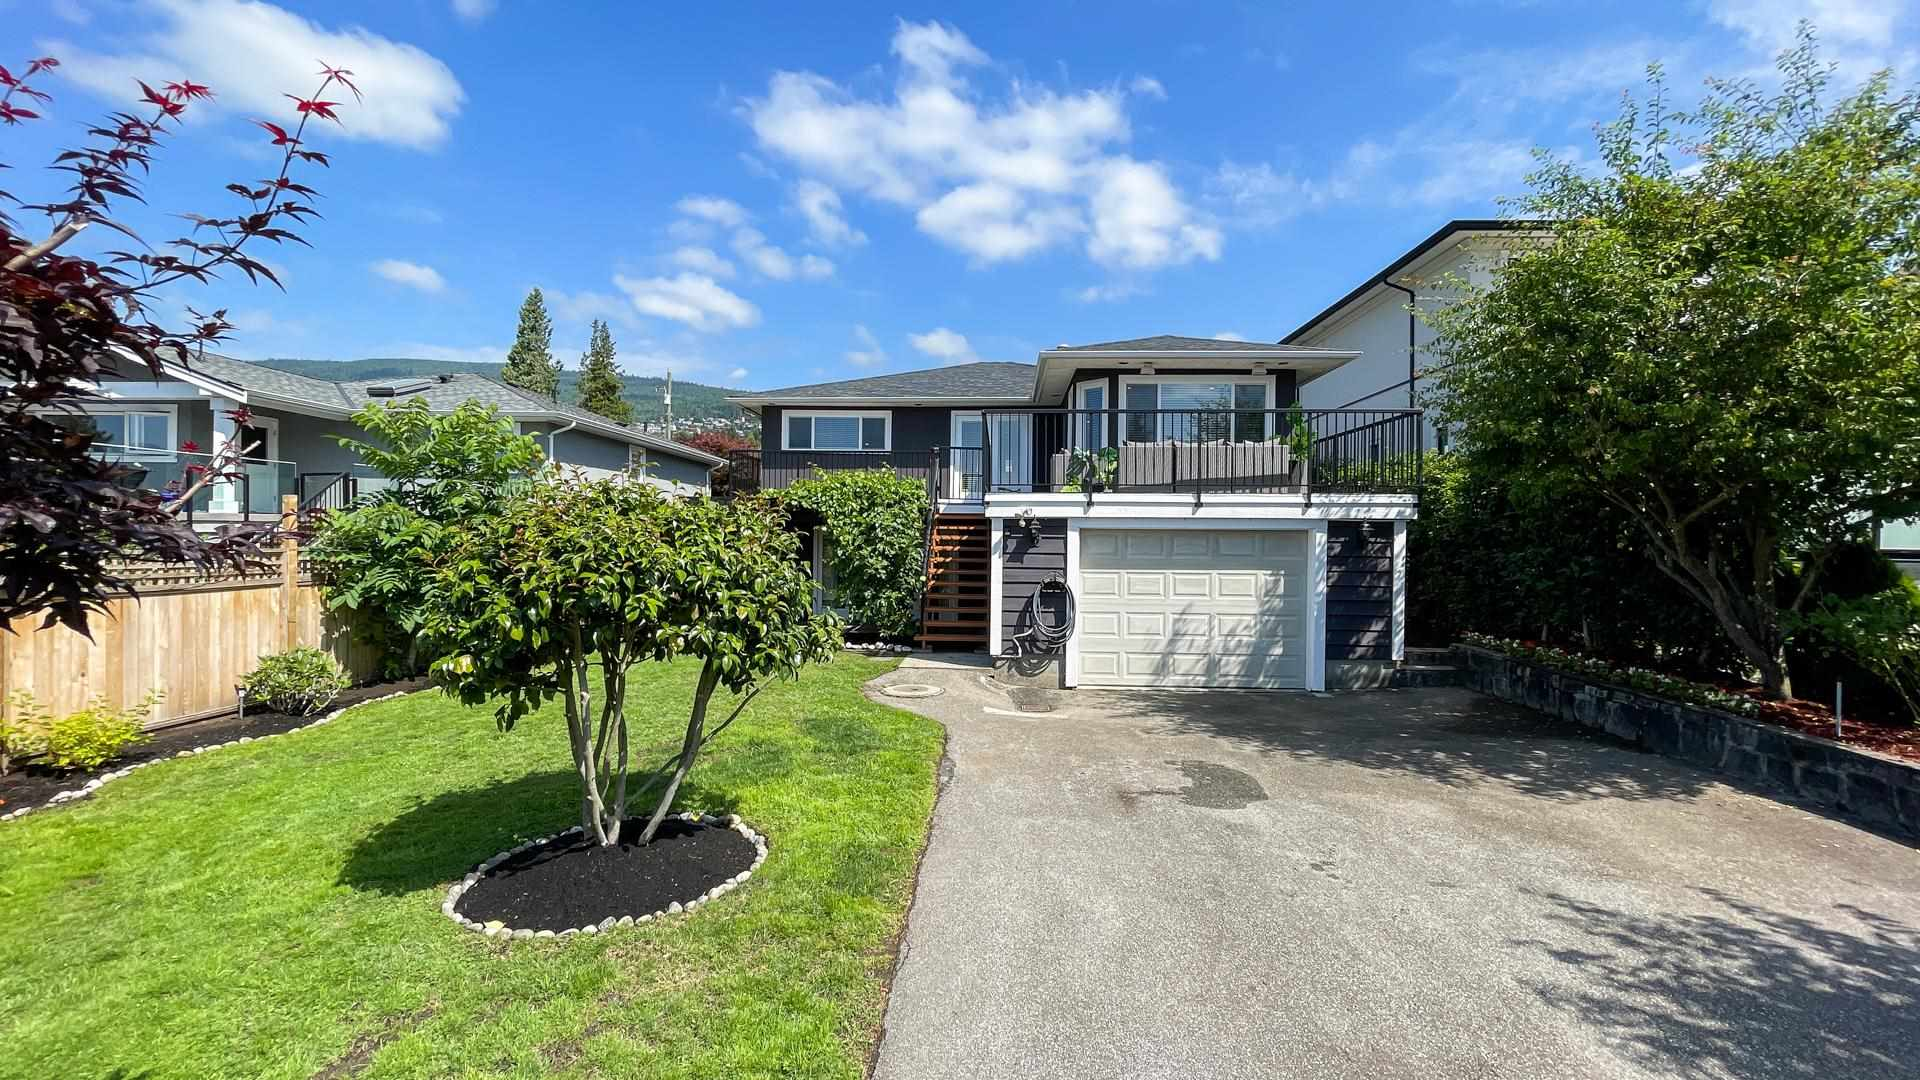 1168 JEFFERSON AVENUE - Ambleside House/Single Family for sale, 6 Bedrooms (R2602275) - #29